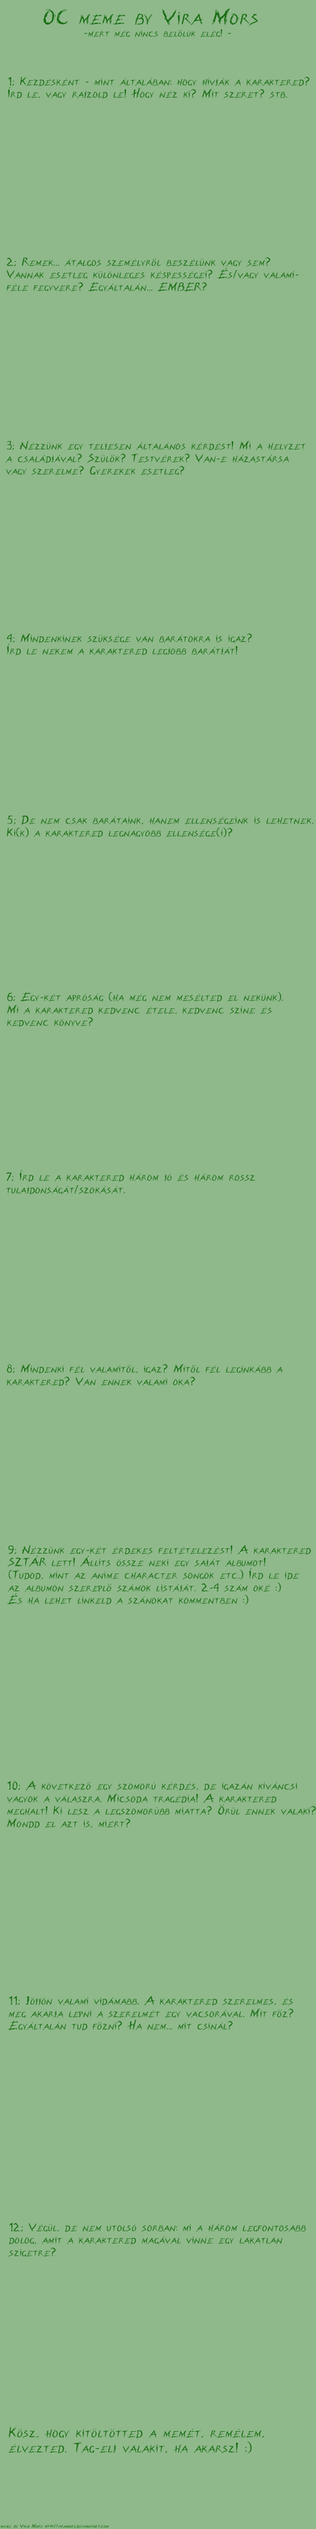 OC meme -Blank-hun- by ViraMors